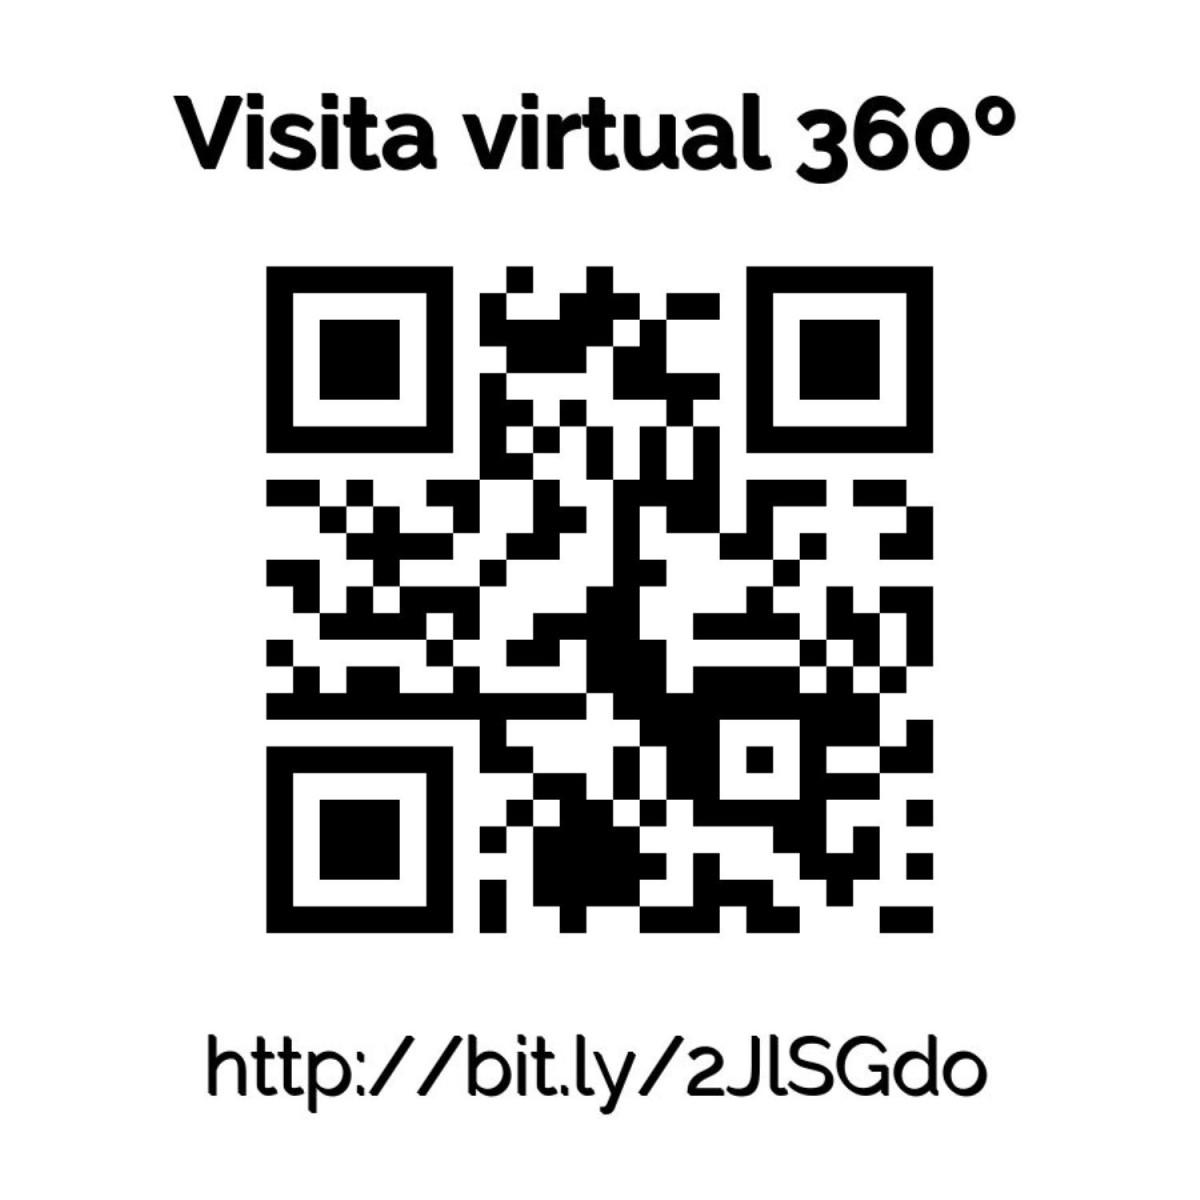 3408-03667